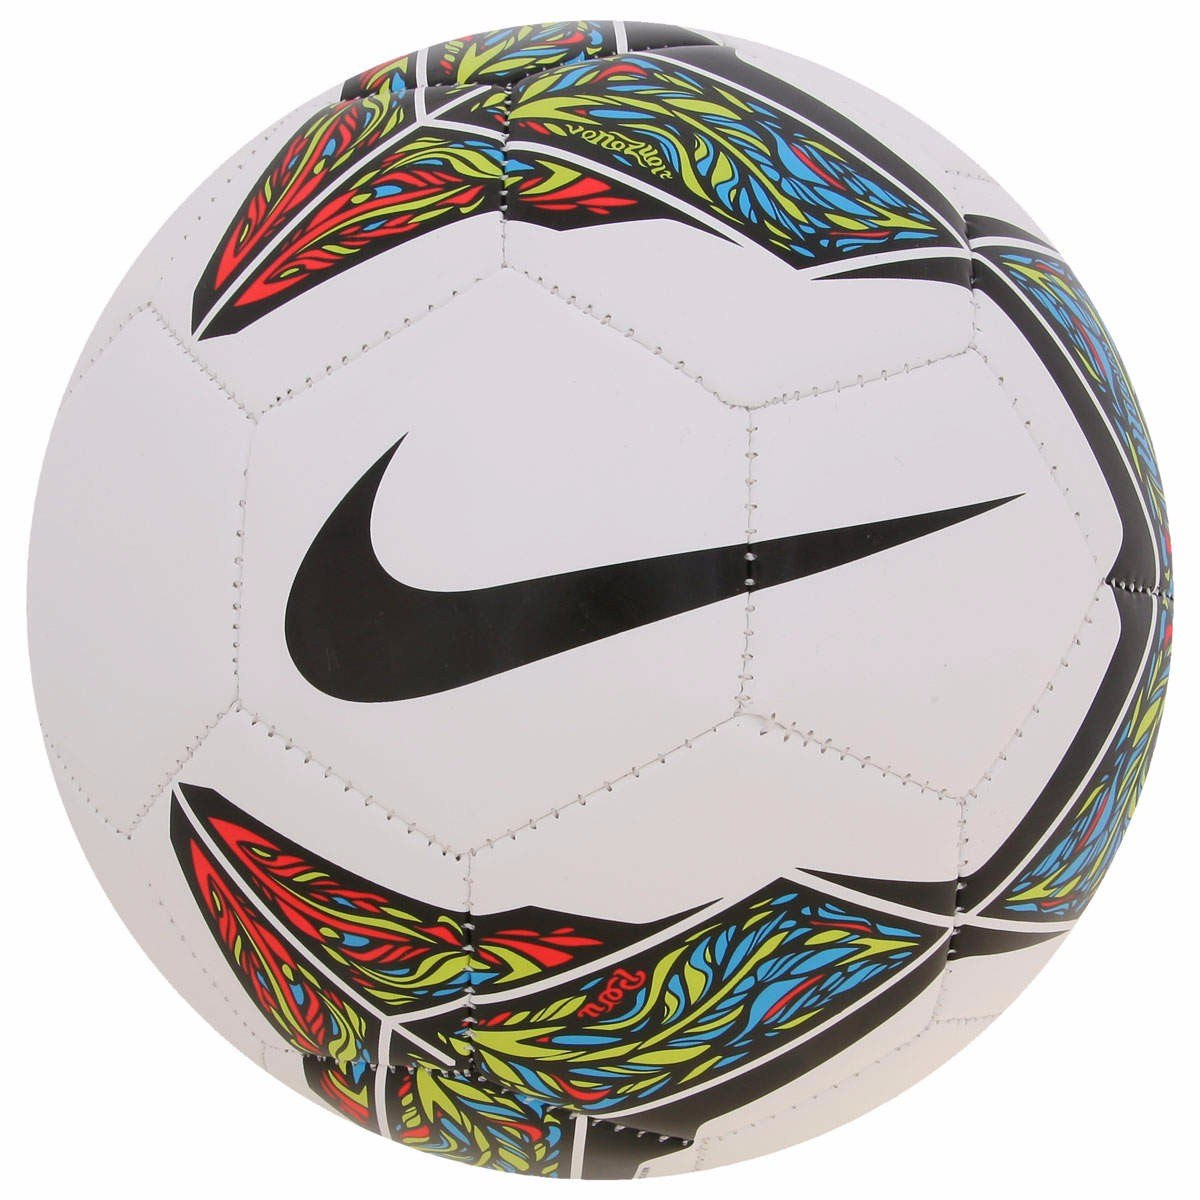 bola de futsal nike rolinho menor csf pro original 1magnus. Carregando zoom. 2f5121c389260